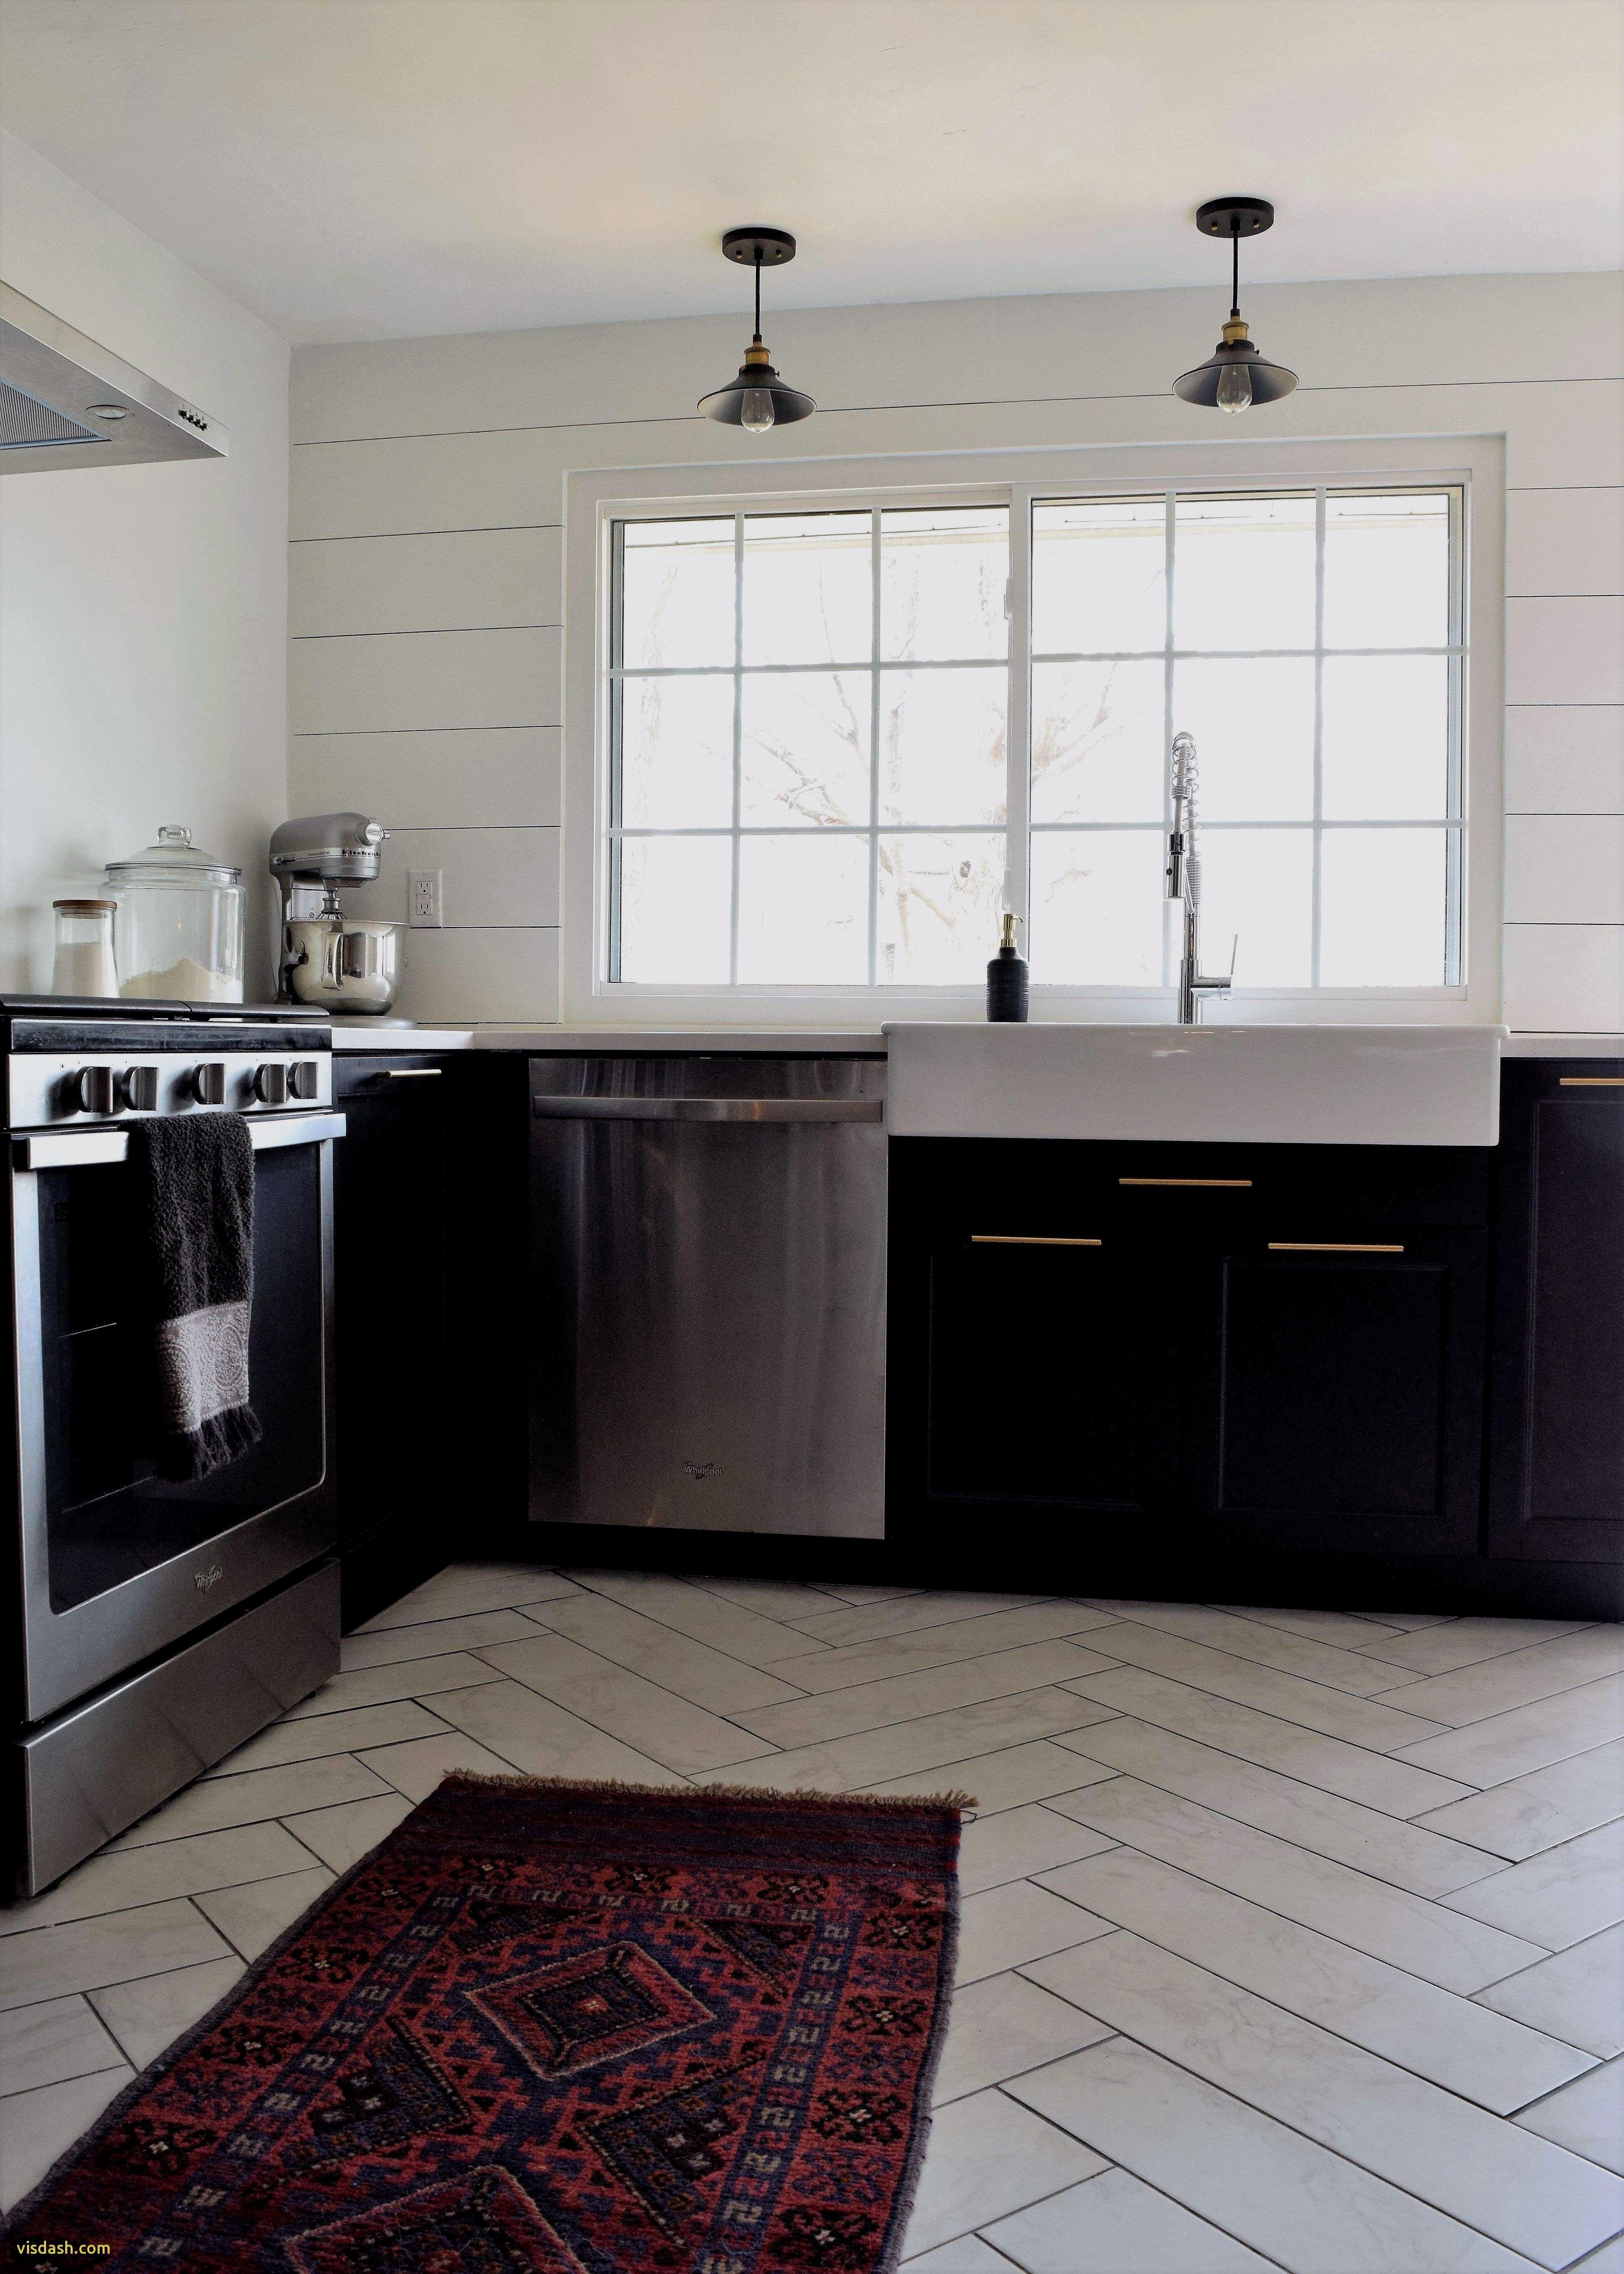 21 Amazing Summer Kitchen Backsplash Ideas Scrapion Com Kitchen Design Small Kitchen Design Pictures Kitchen Design Images